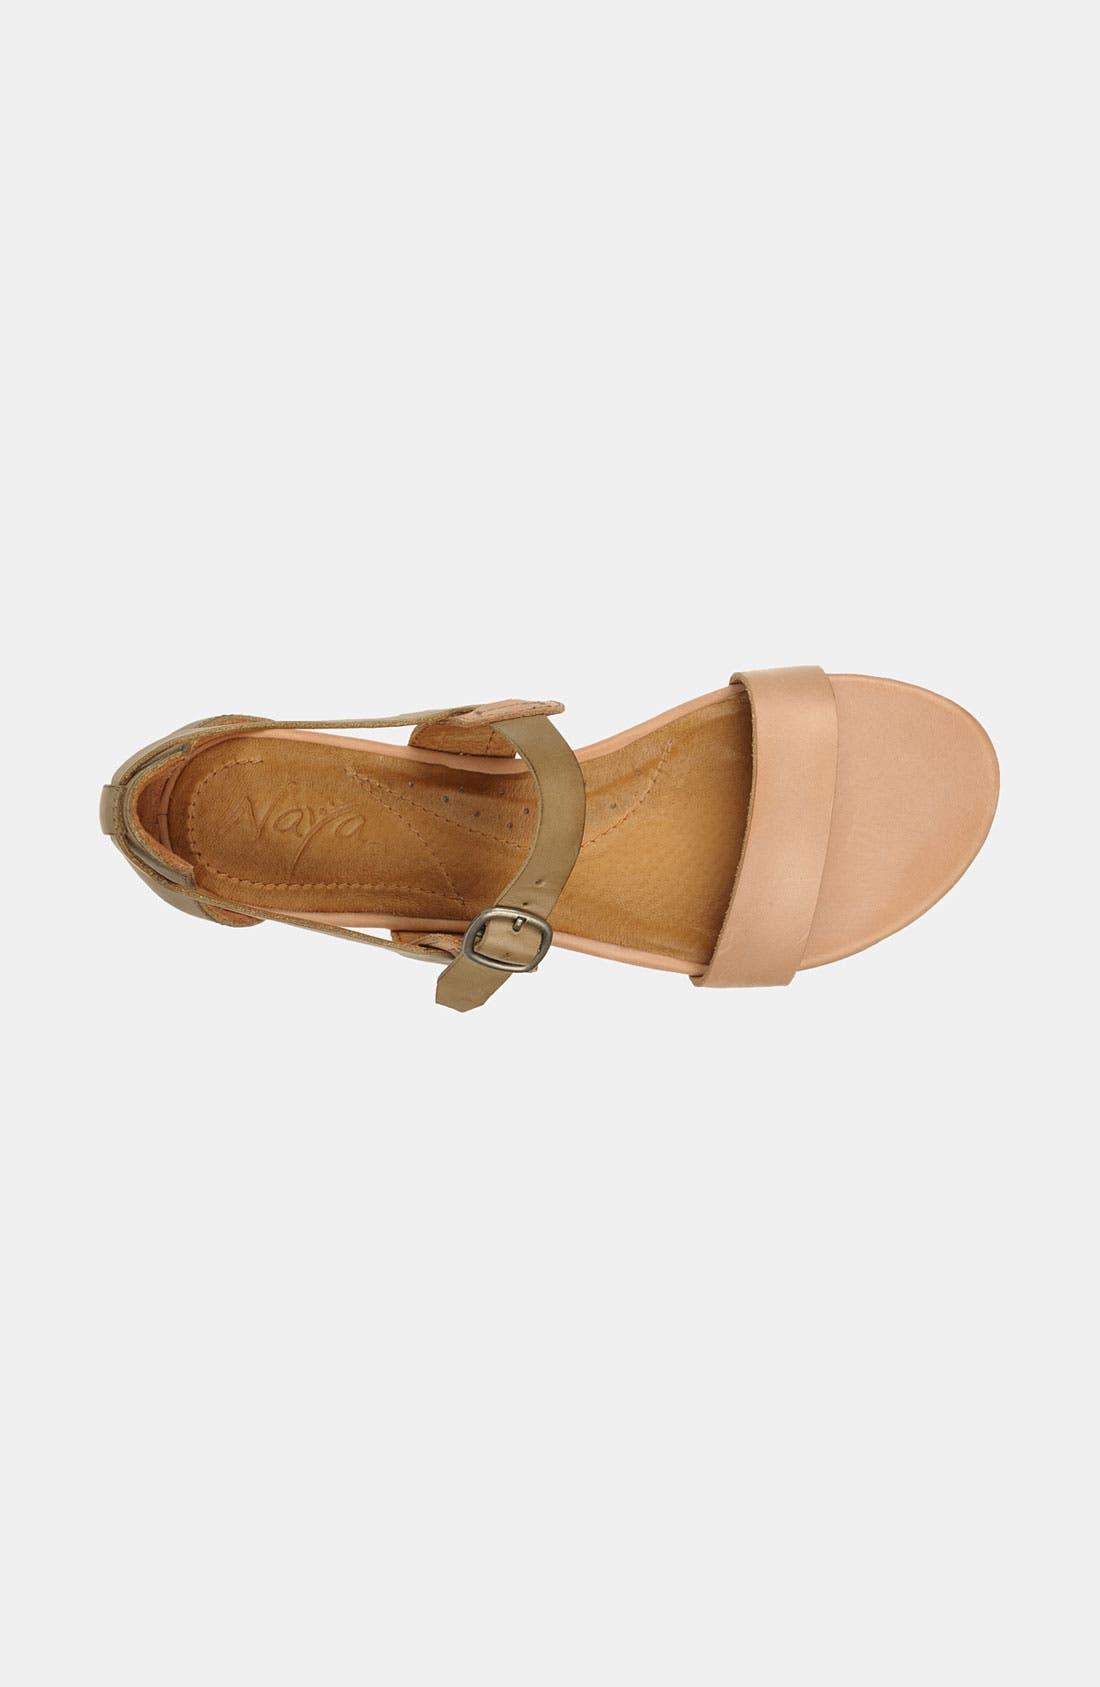 Alternate Image 3  - Naya 'Helena' Sandal (Online Only)